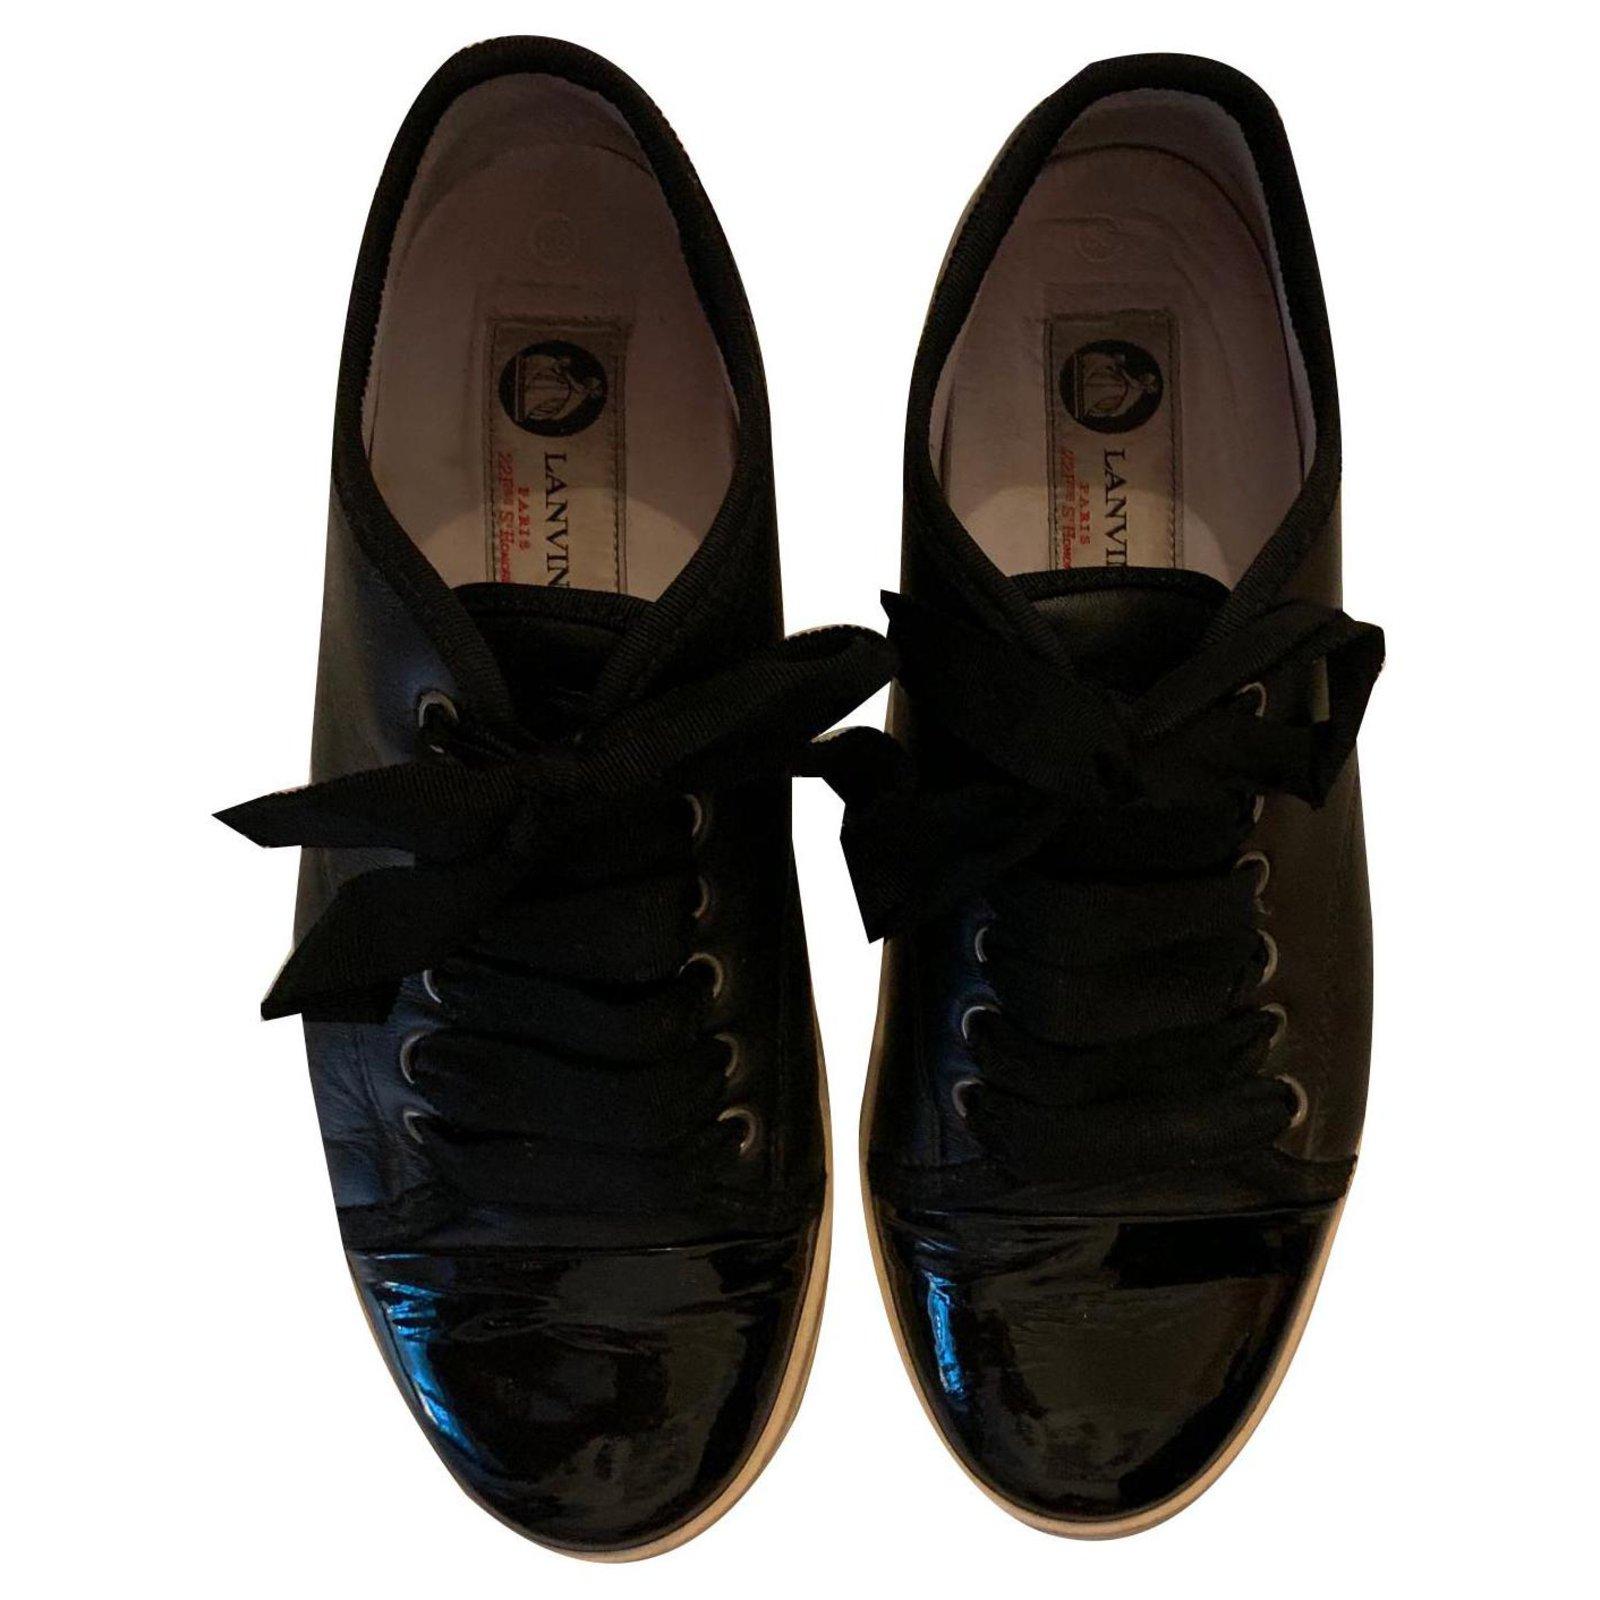 Lanvin Sneakers Lanvin Sneakers Leather